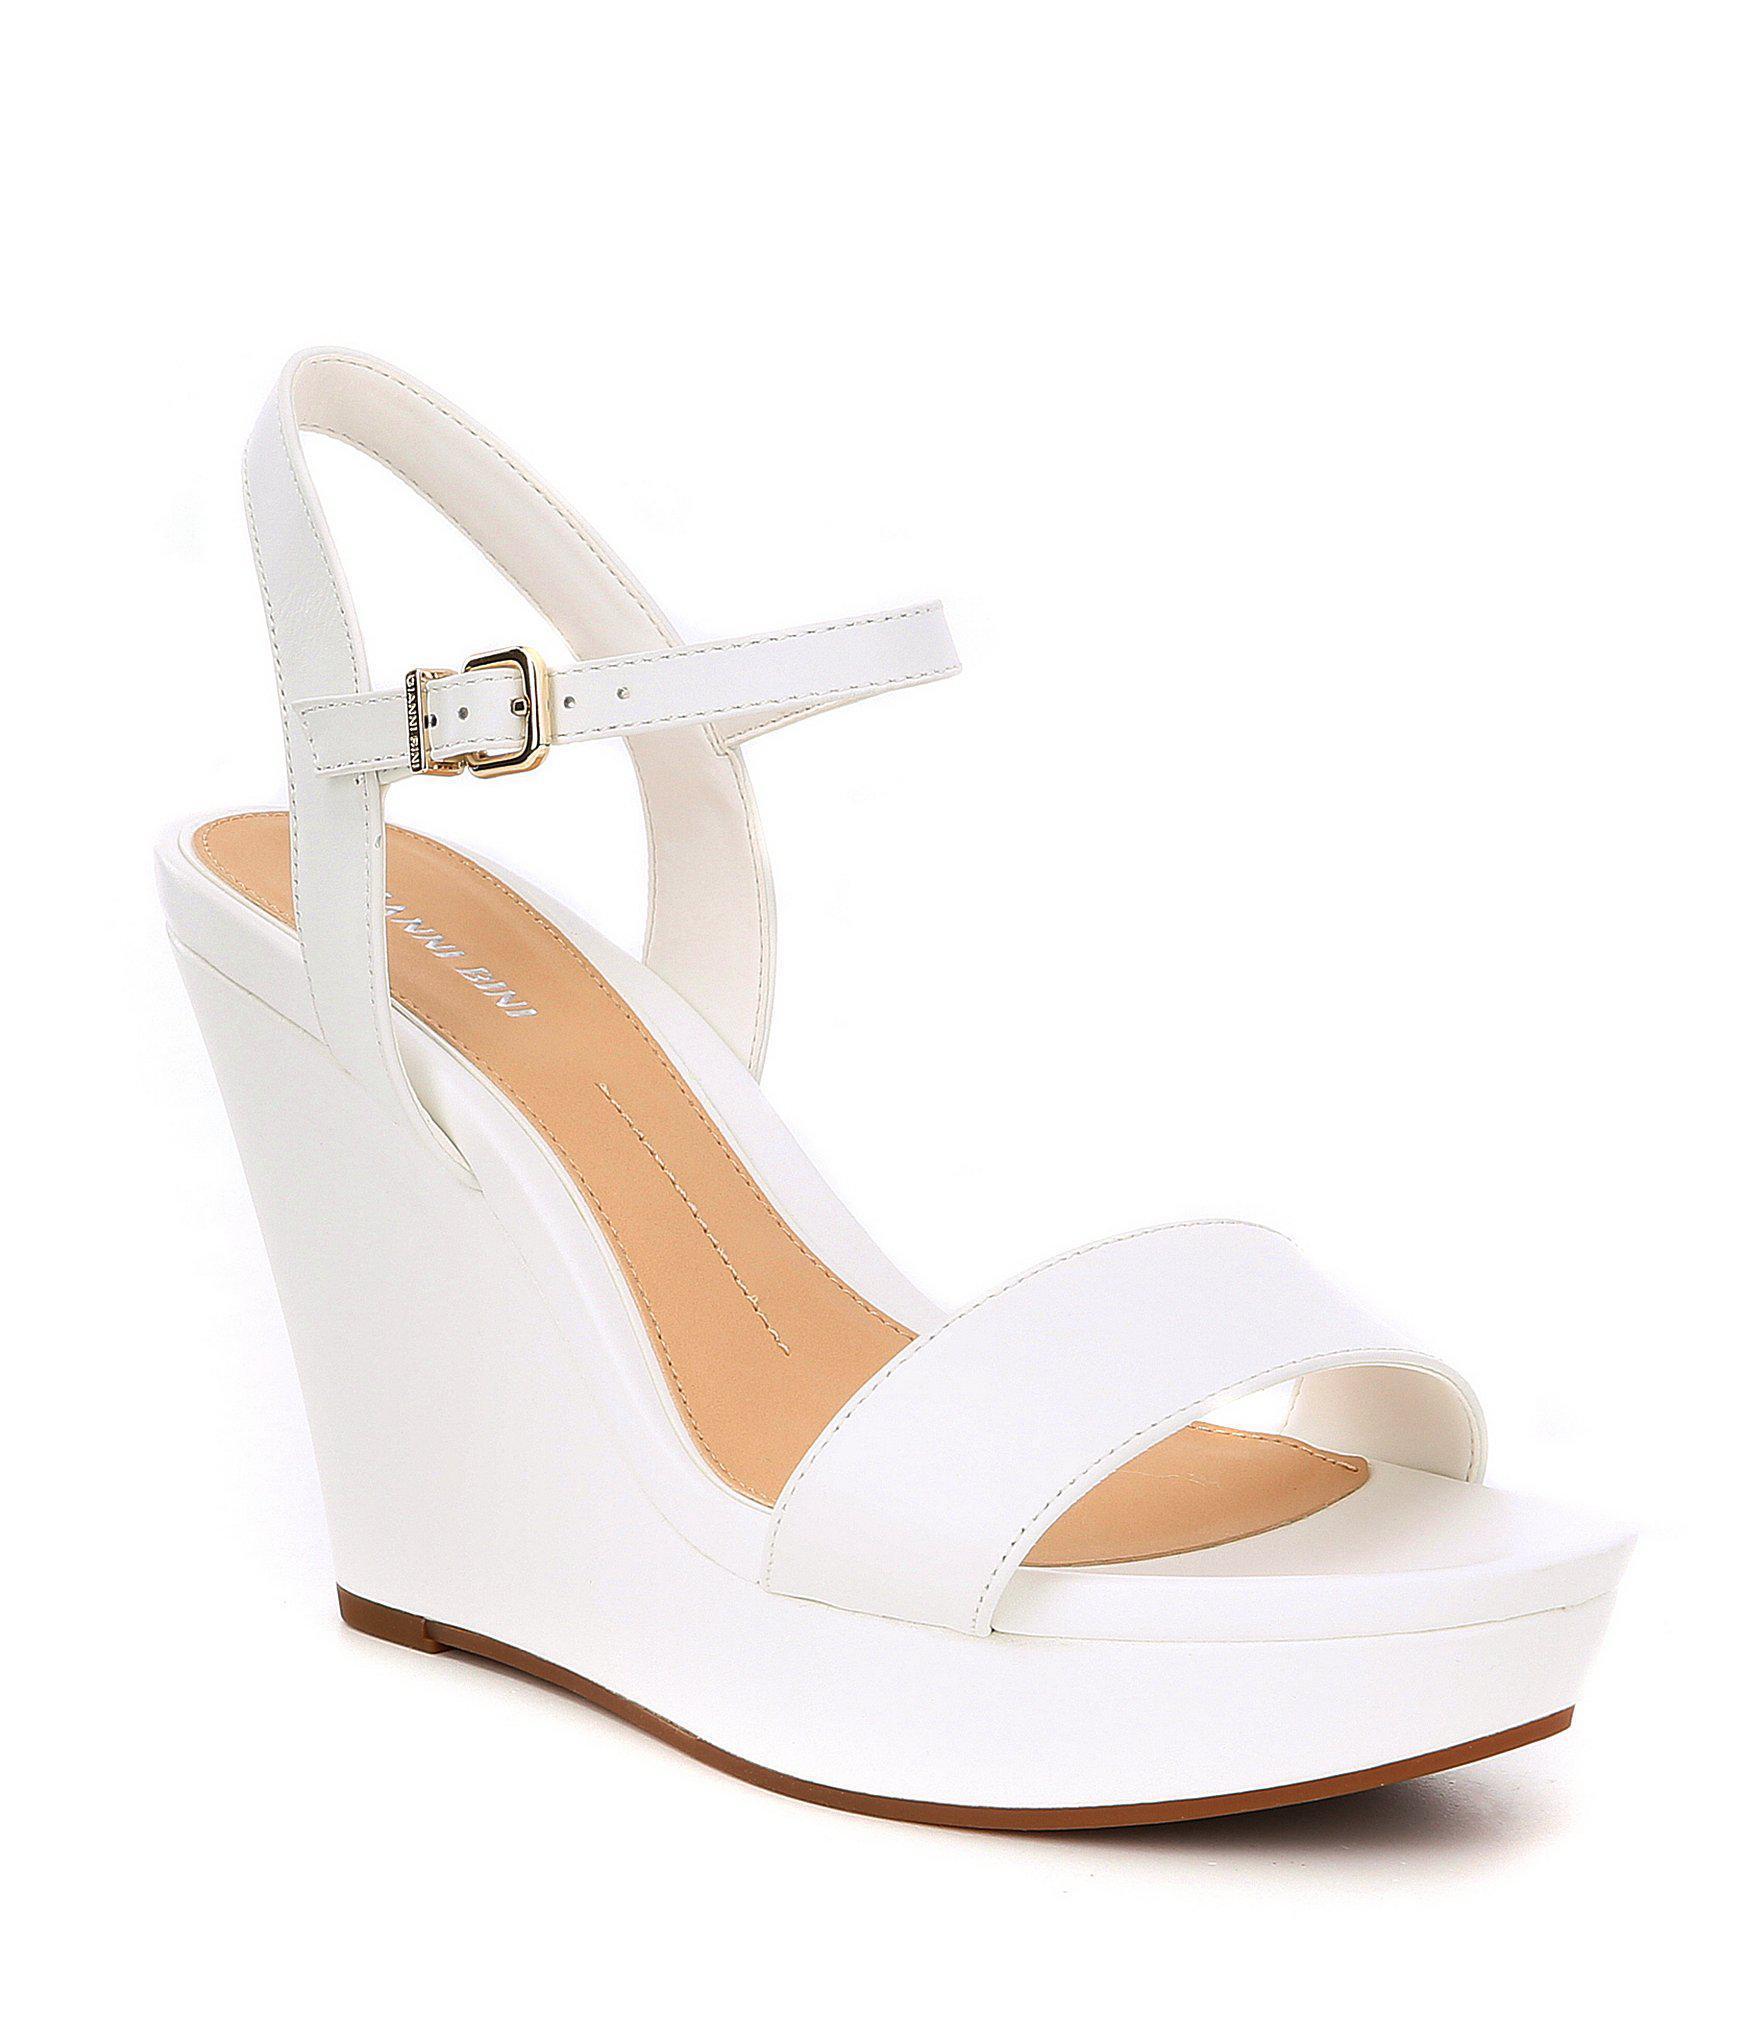 a10d79ab0522 Lyst - Gianni Bini Juudeth Leather Wedges in White